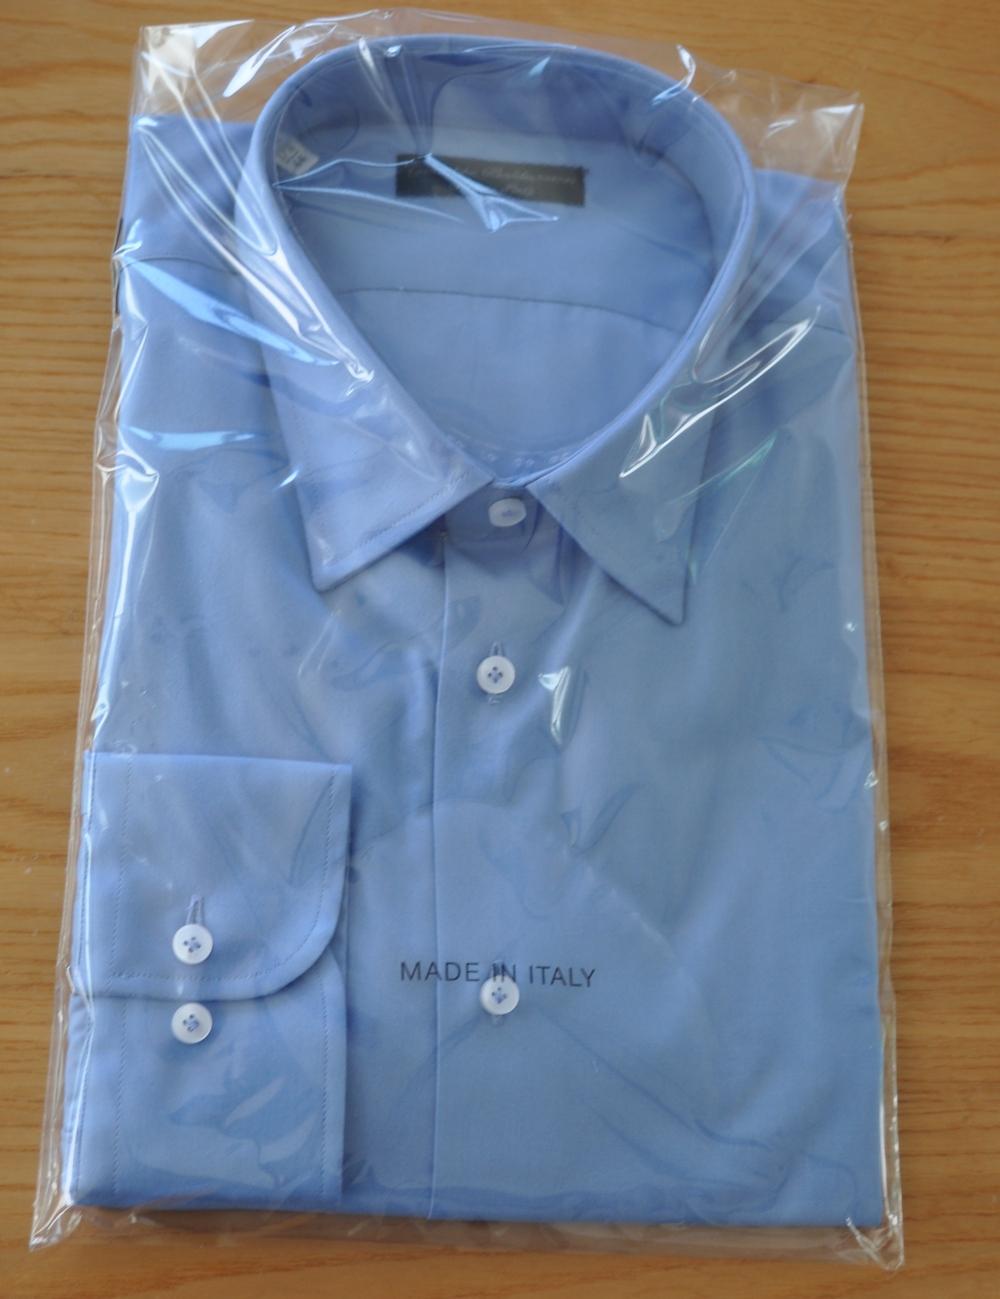 Wedding Dress Shirt Made In Italy Tuxedo Fashion Style 100% Cotton ...